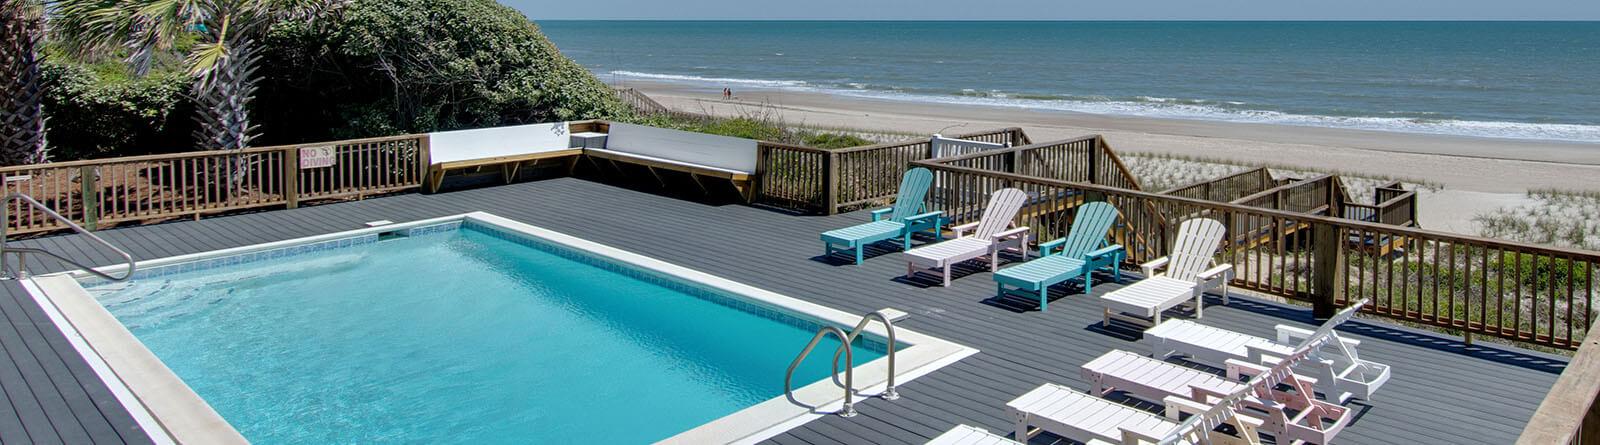 Luxury Vacation Rentals in Emerald Isle and North Carolina's Crystal Coast